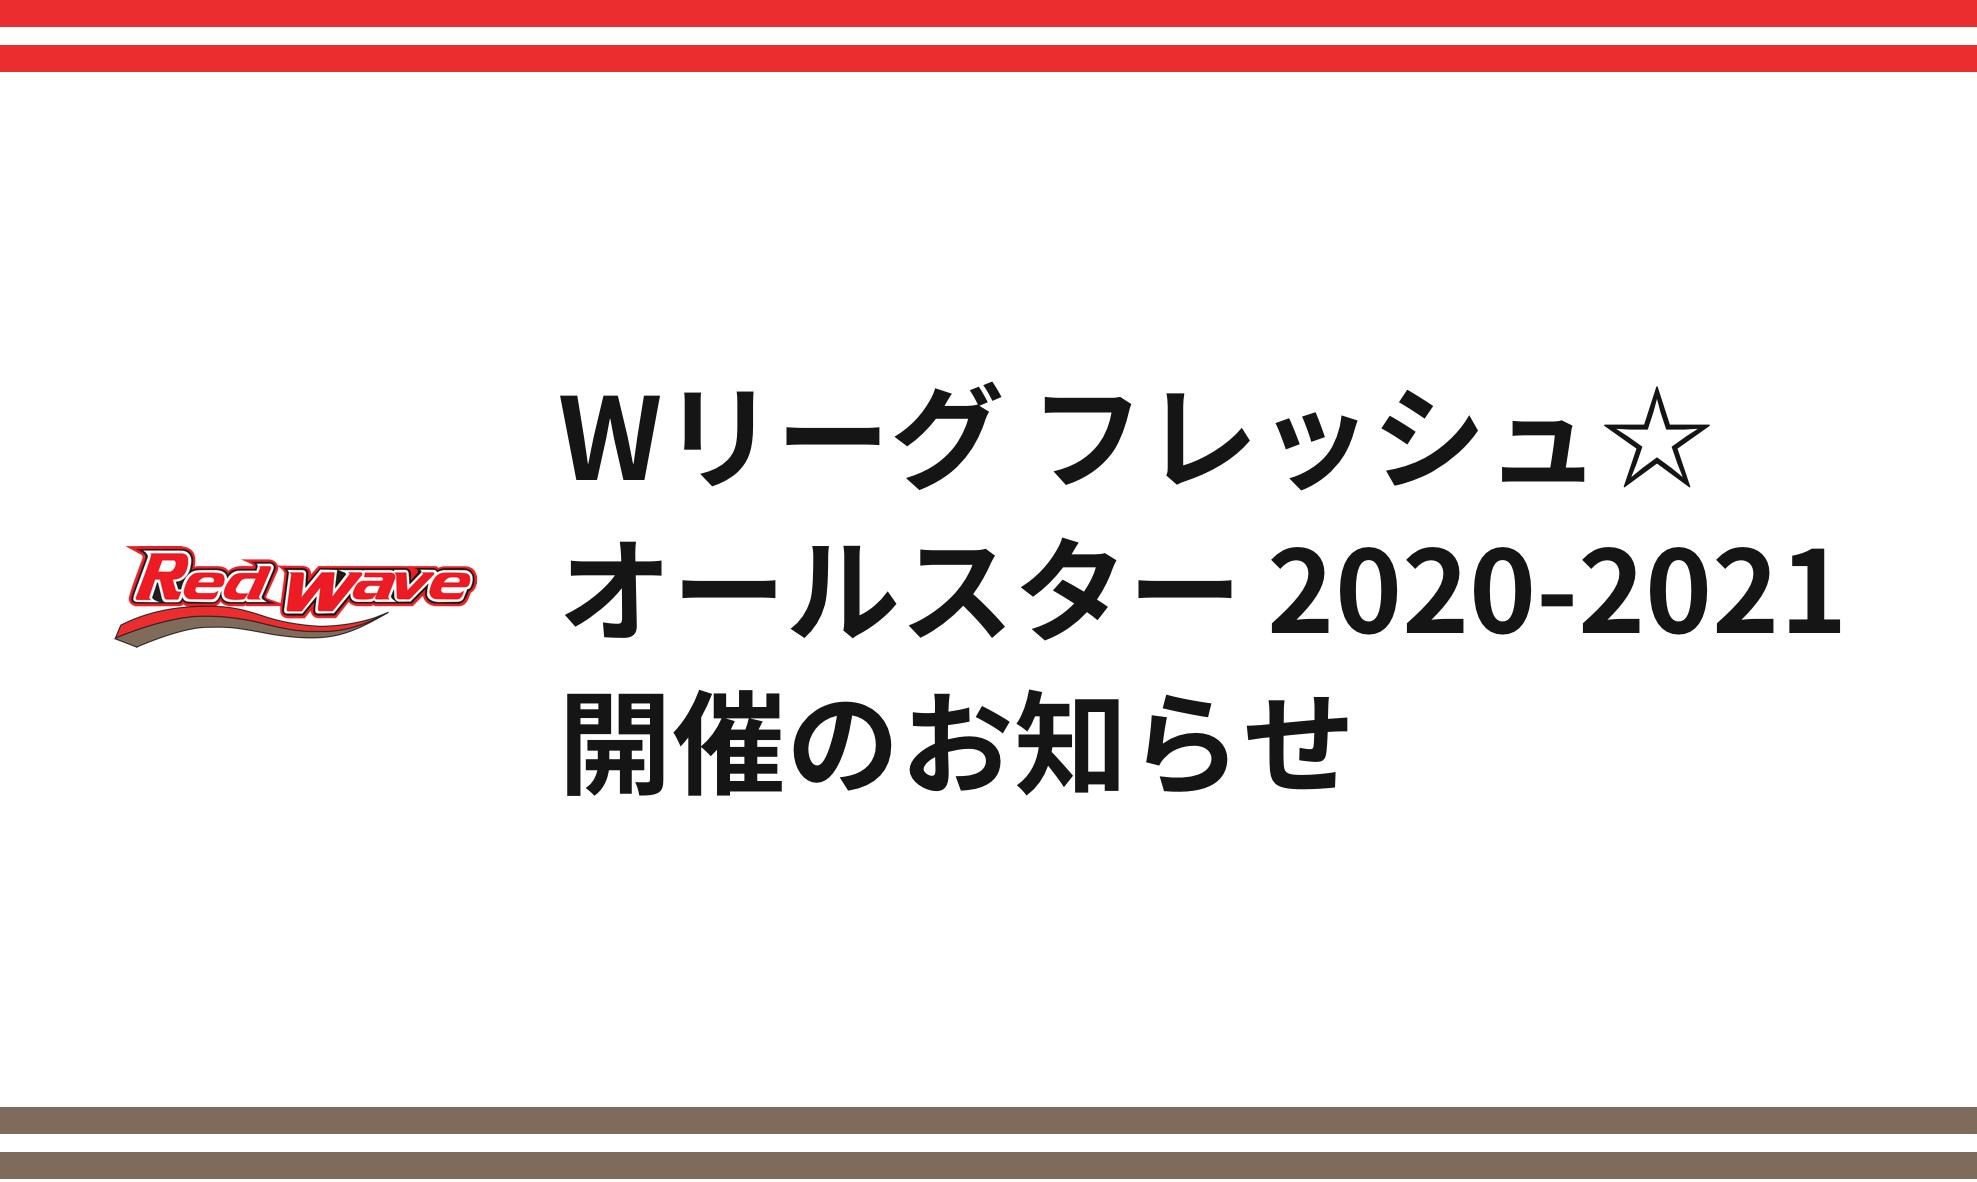 「Wリーグ フレッシュ☆オールス …